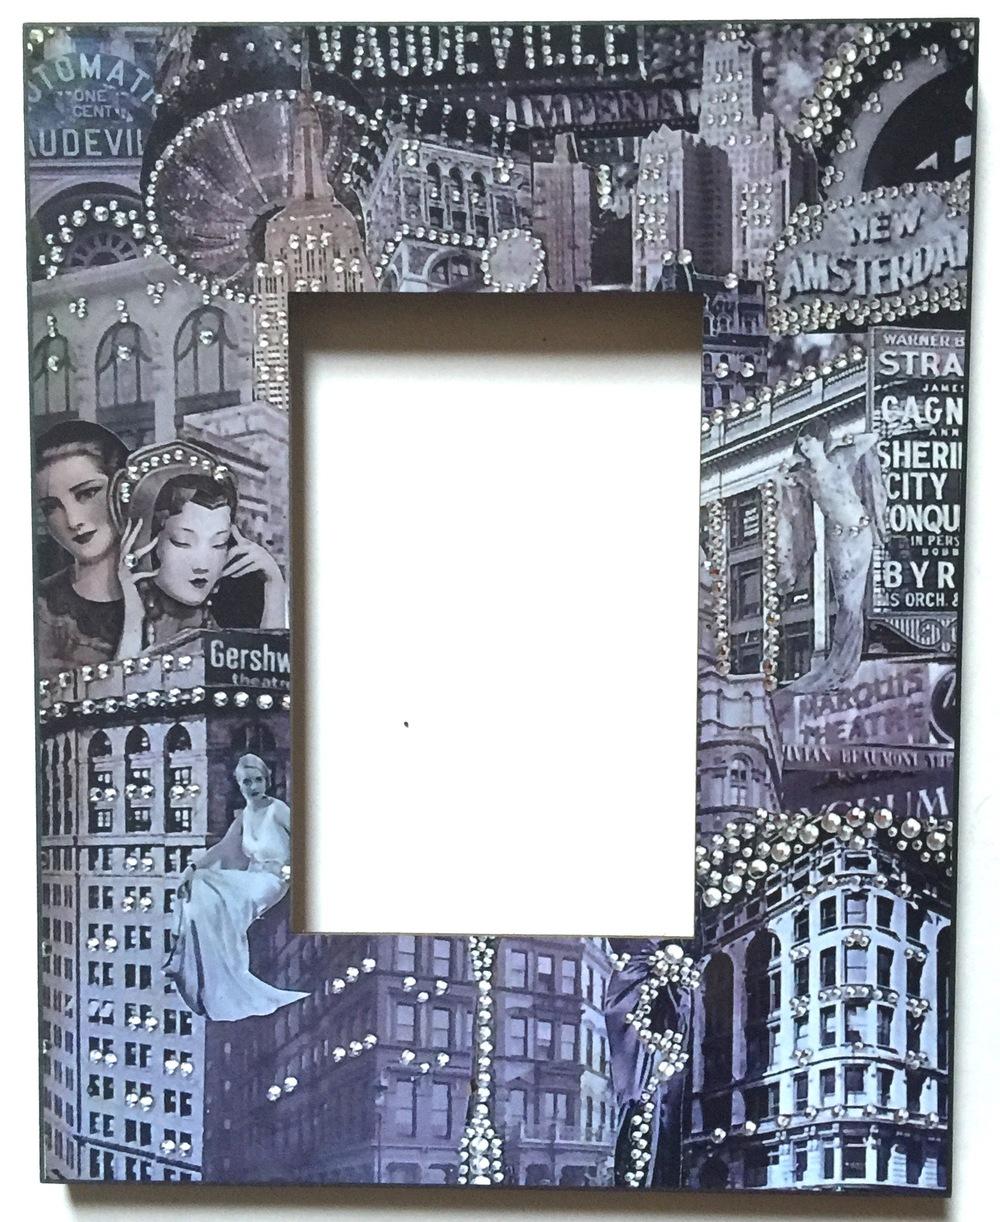 Vaudeville Printed Frame 4x6 $65